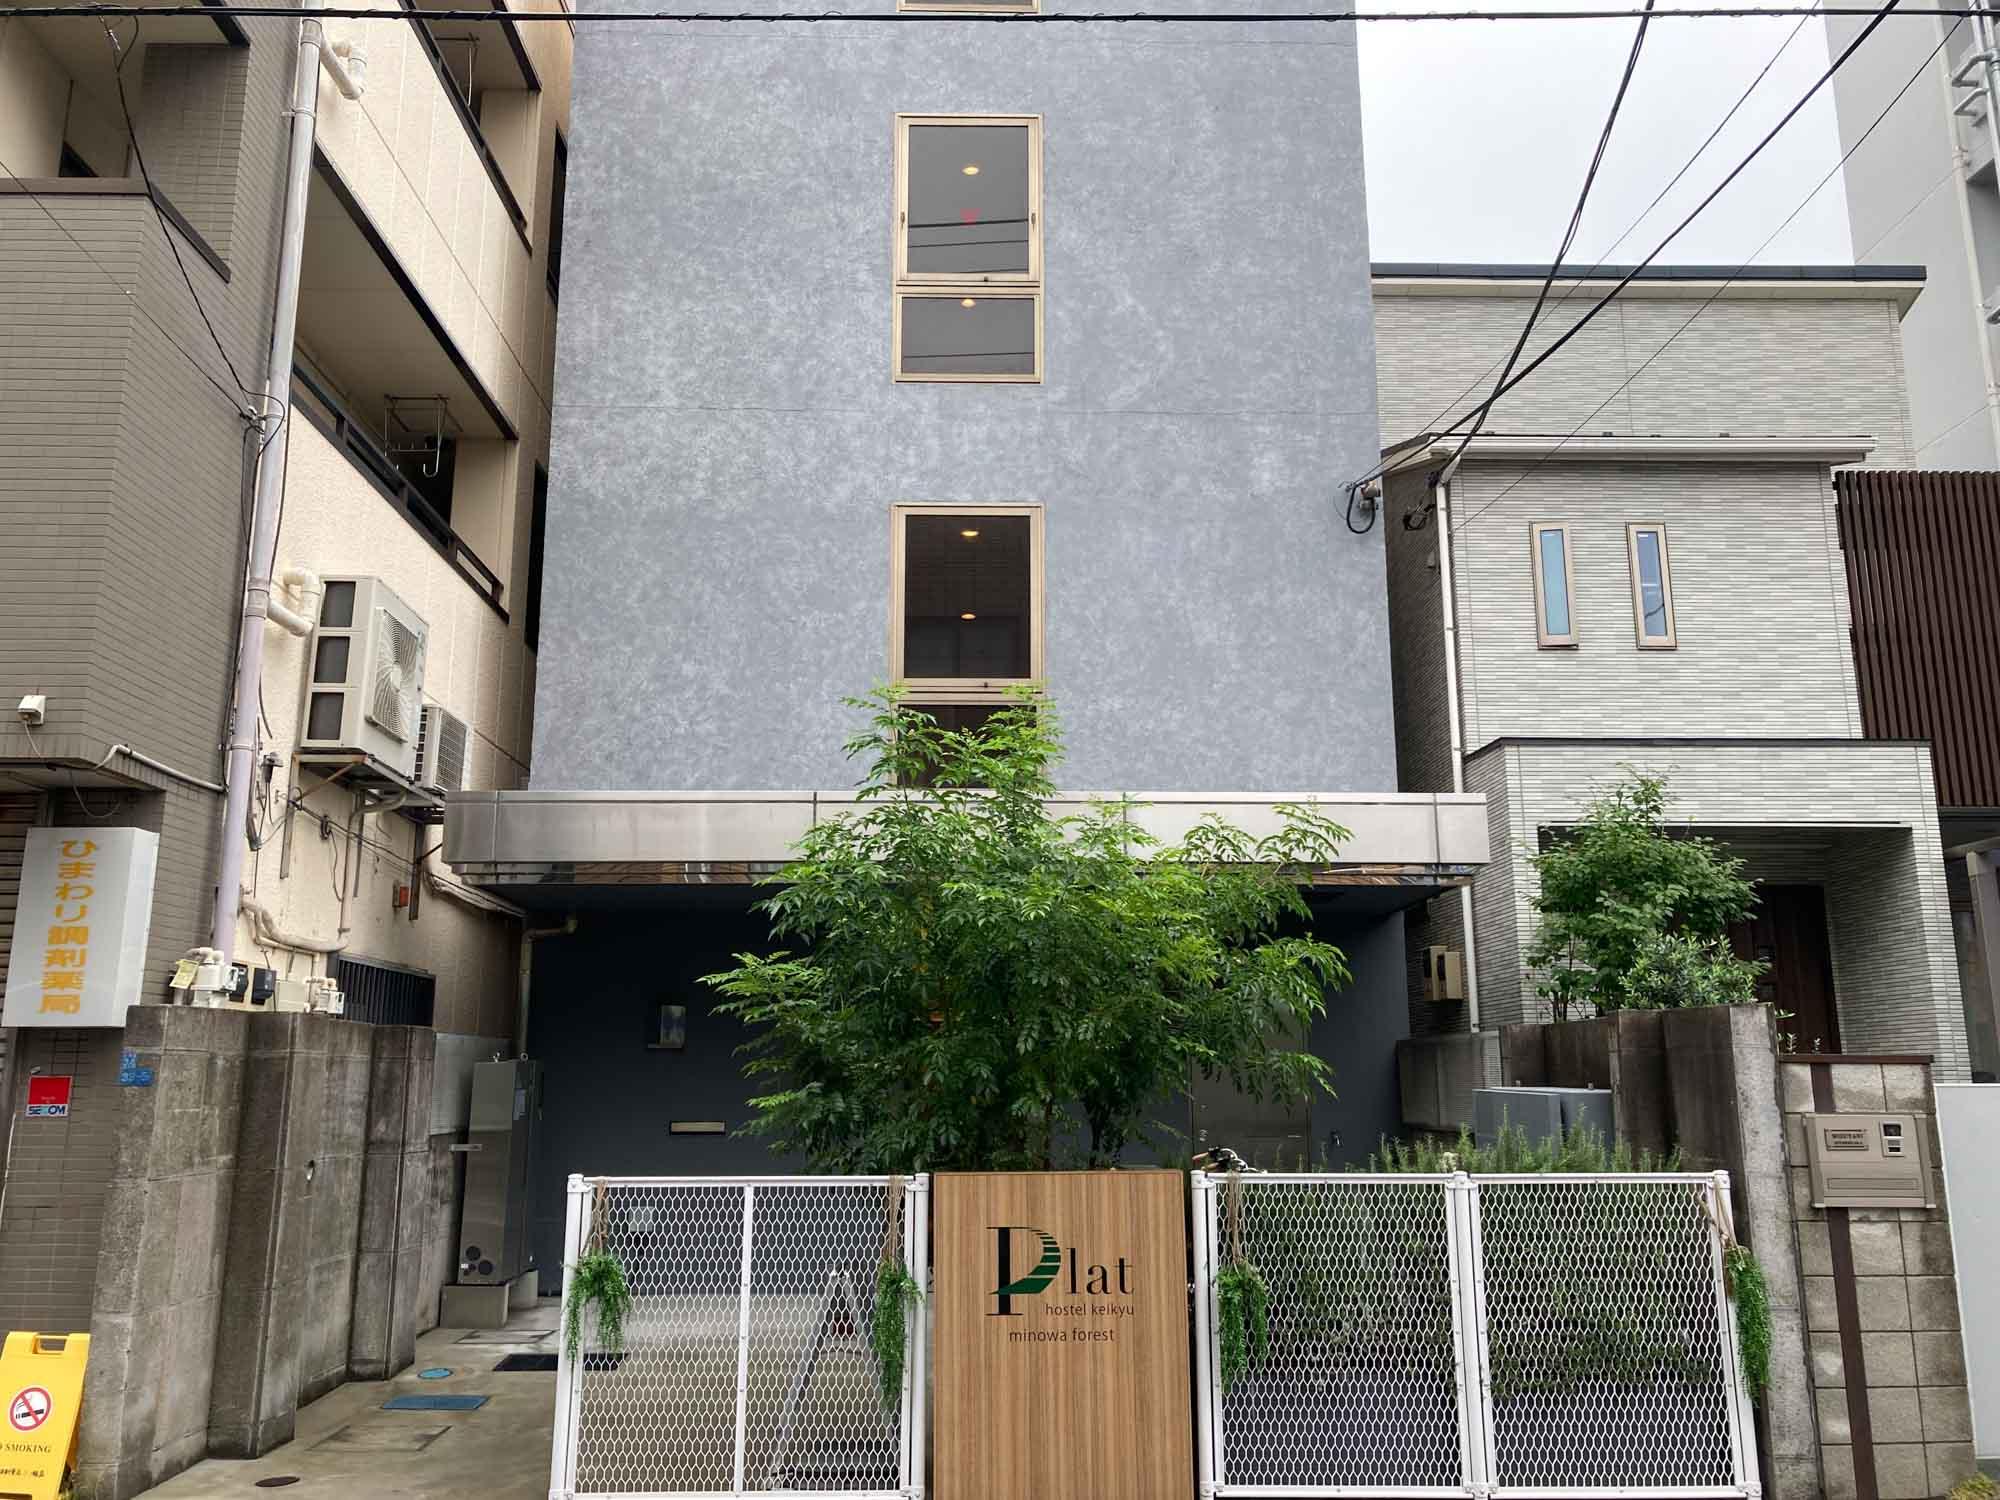 「plat hostel keikyu minowa forest」は、日比谷線の三ノ輪駅から徒歩5分。静かな下町の住宅街に立地します。